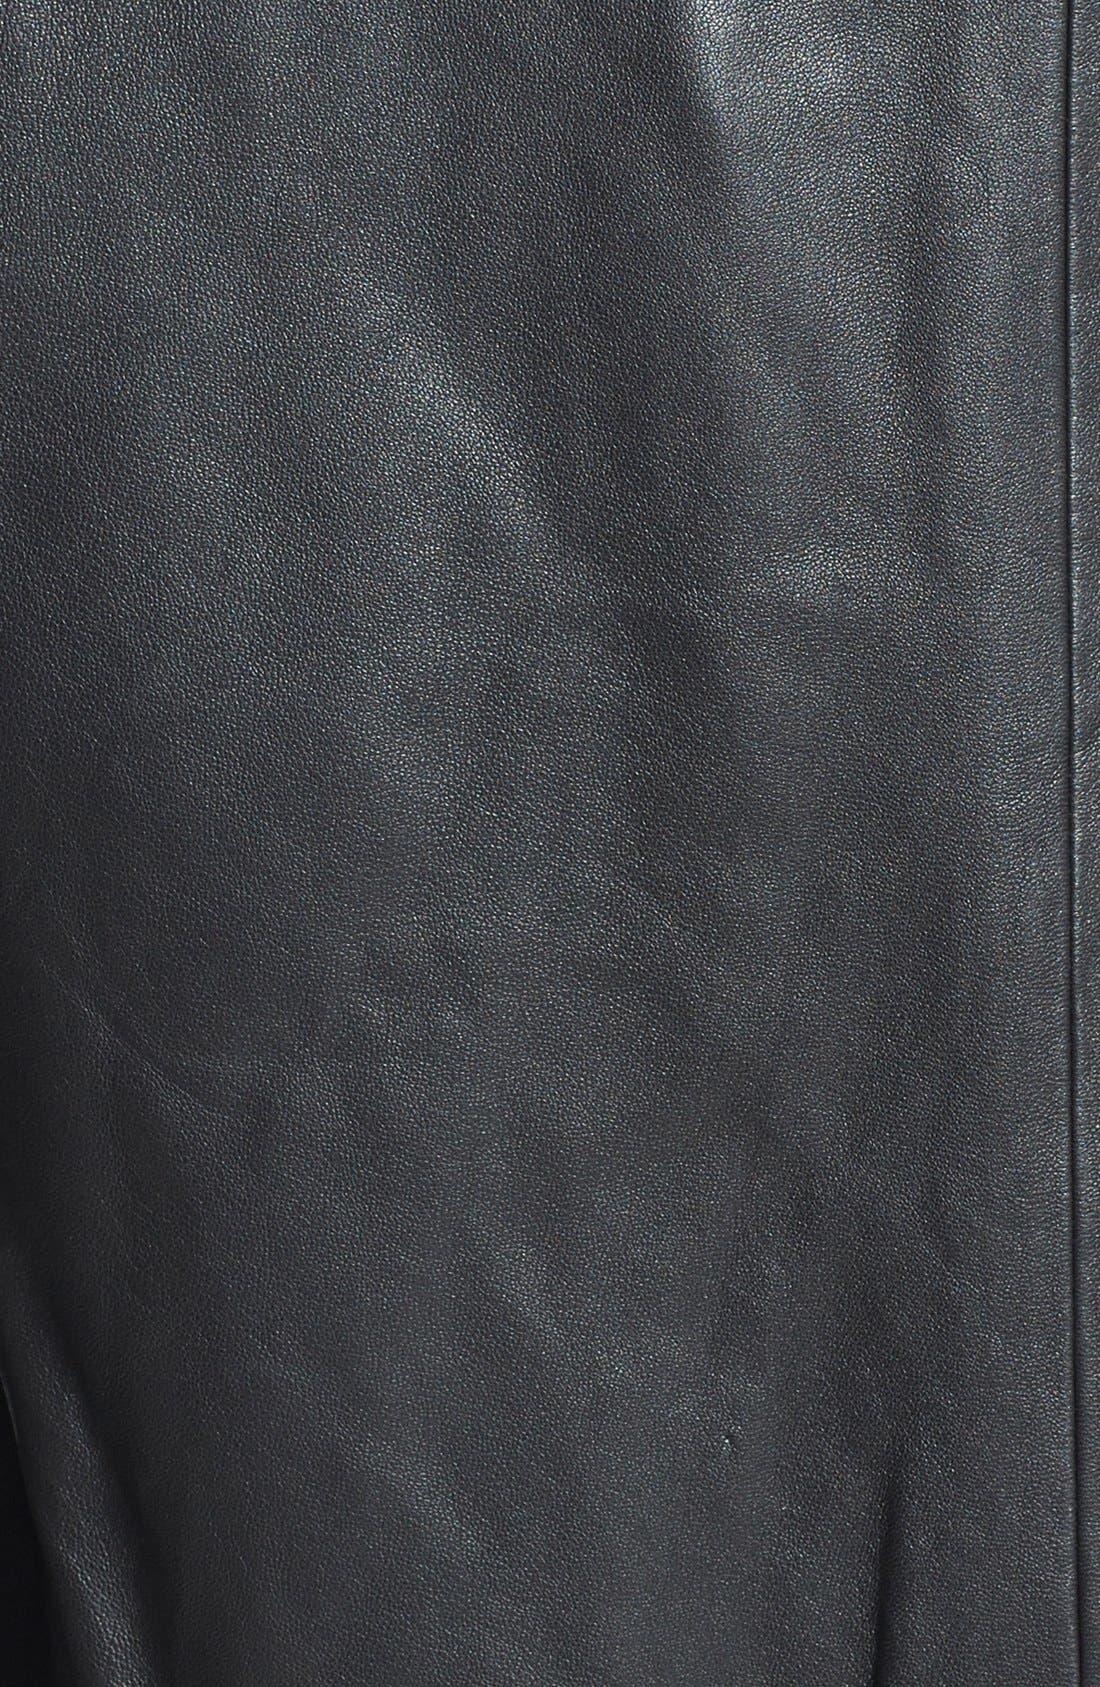 Hooded Leather Bomber Jacket,                             Alternate thumbnail 3, color,                             001